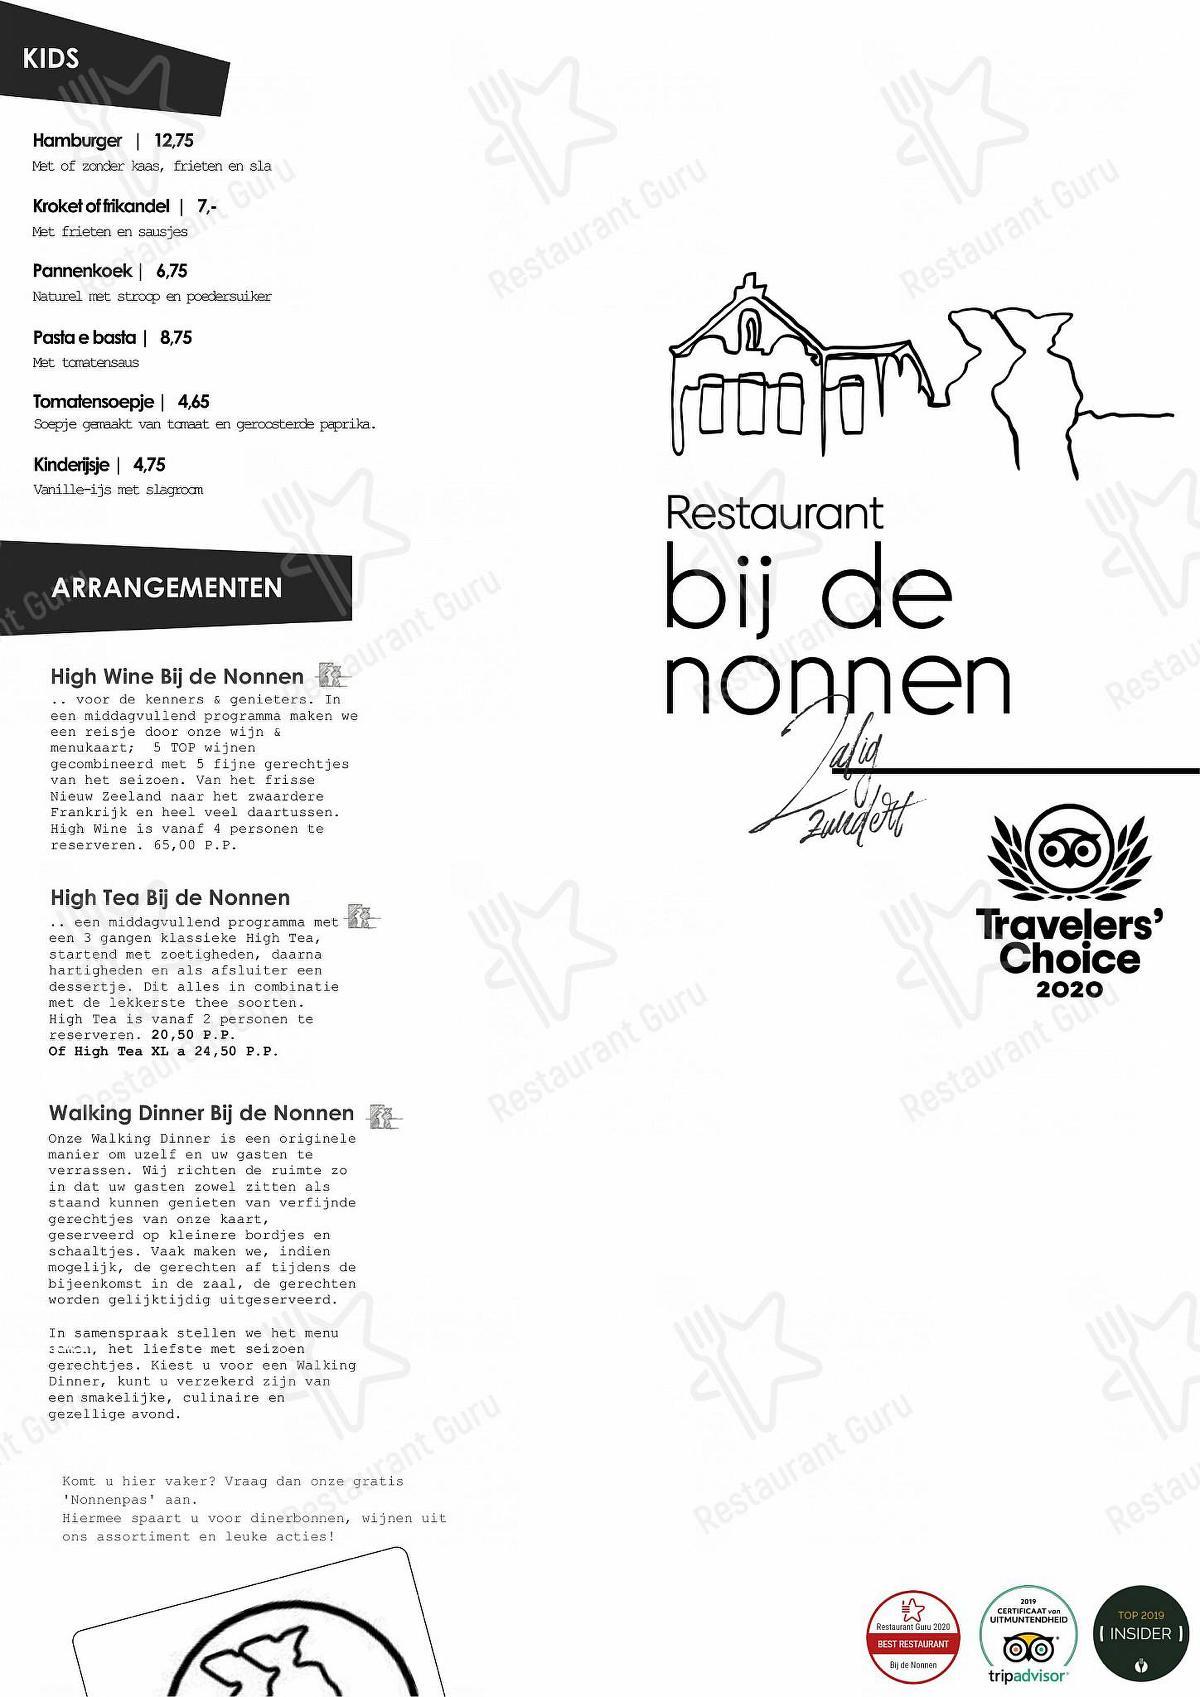 Check out the menu for Bij de Nonnen